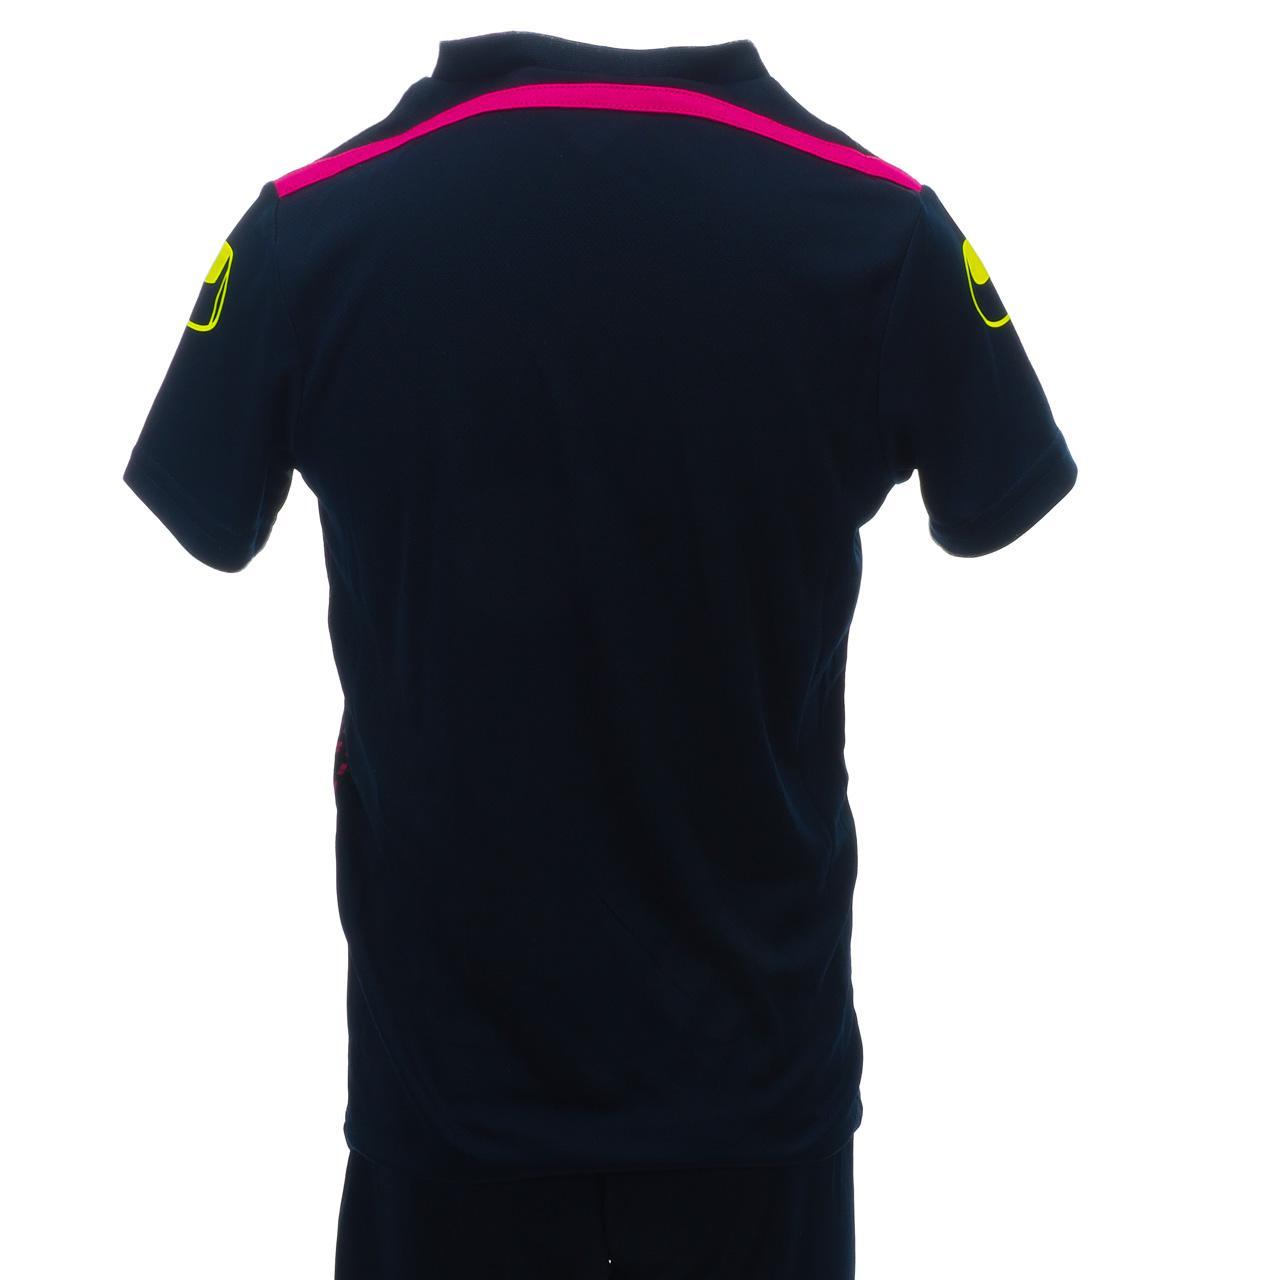 Set-Minikit-Football-Uhlsport-League-1-Jr-Jersey-Sh-Blue-49993-New thumbnail 3